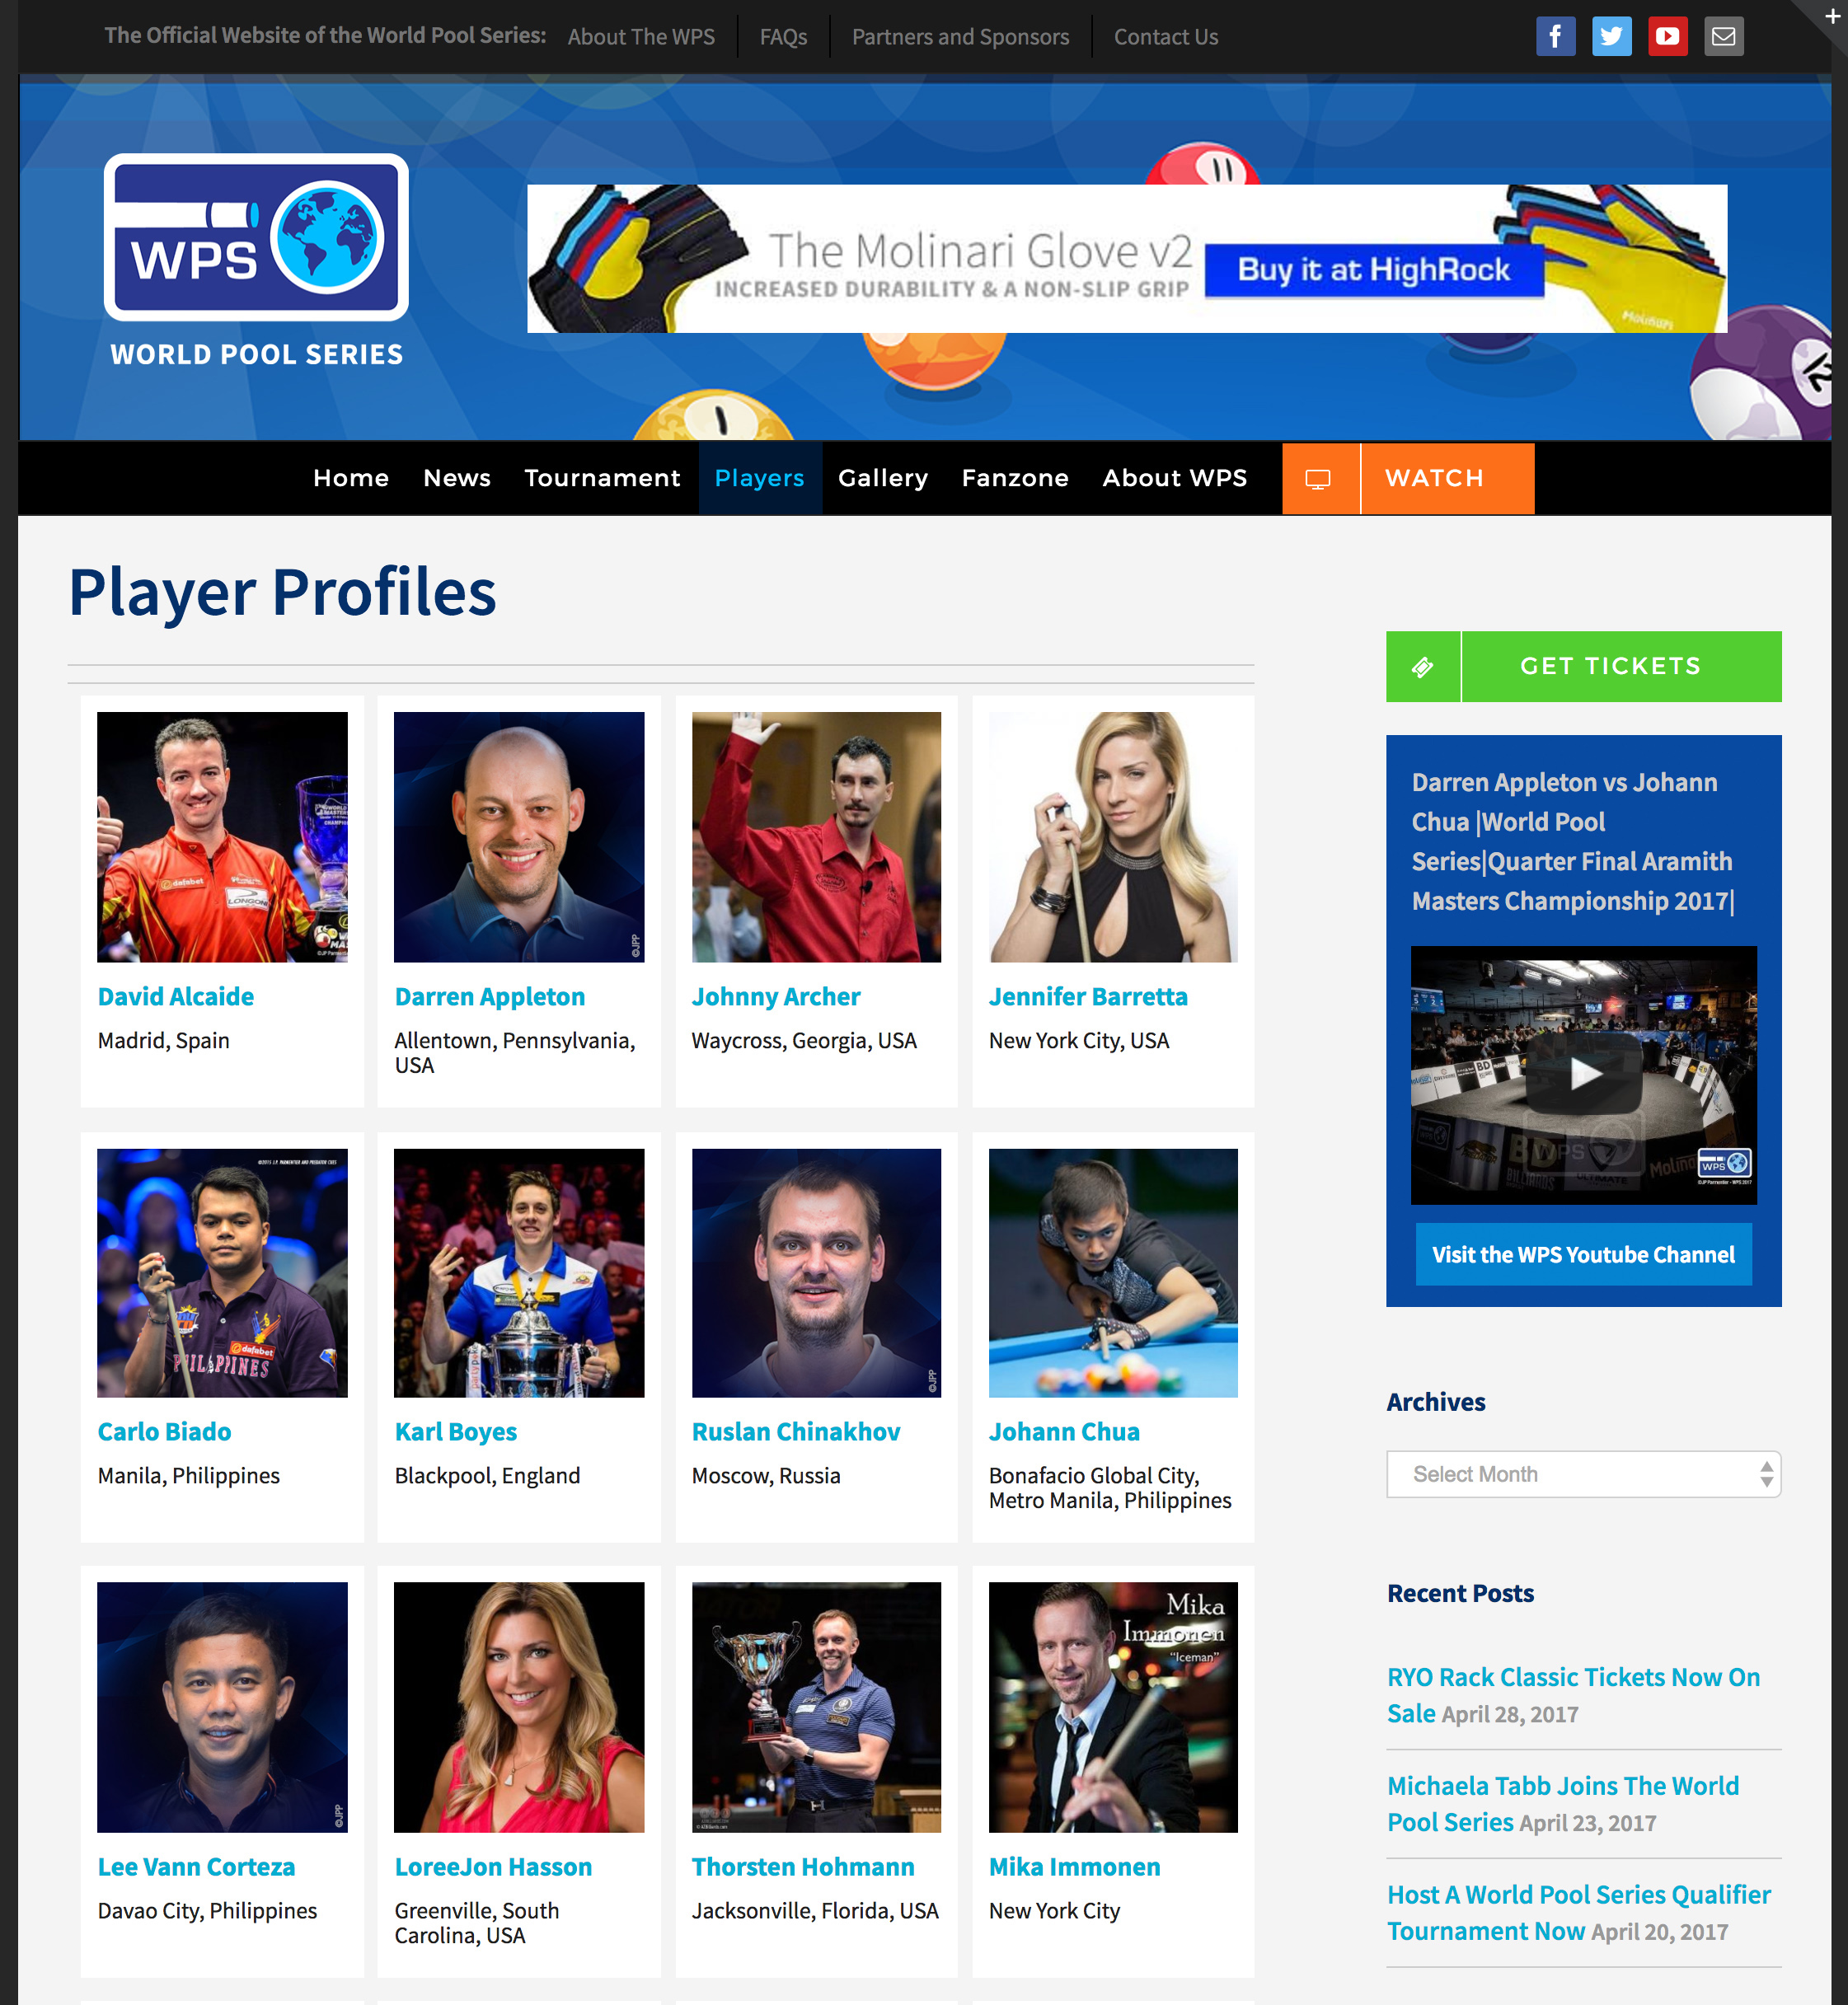 WPS player profiles